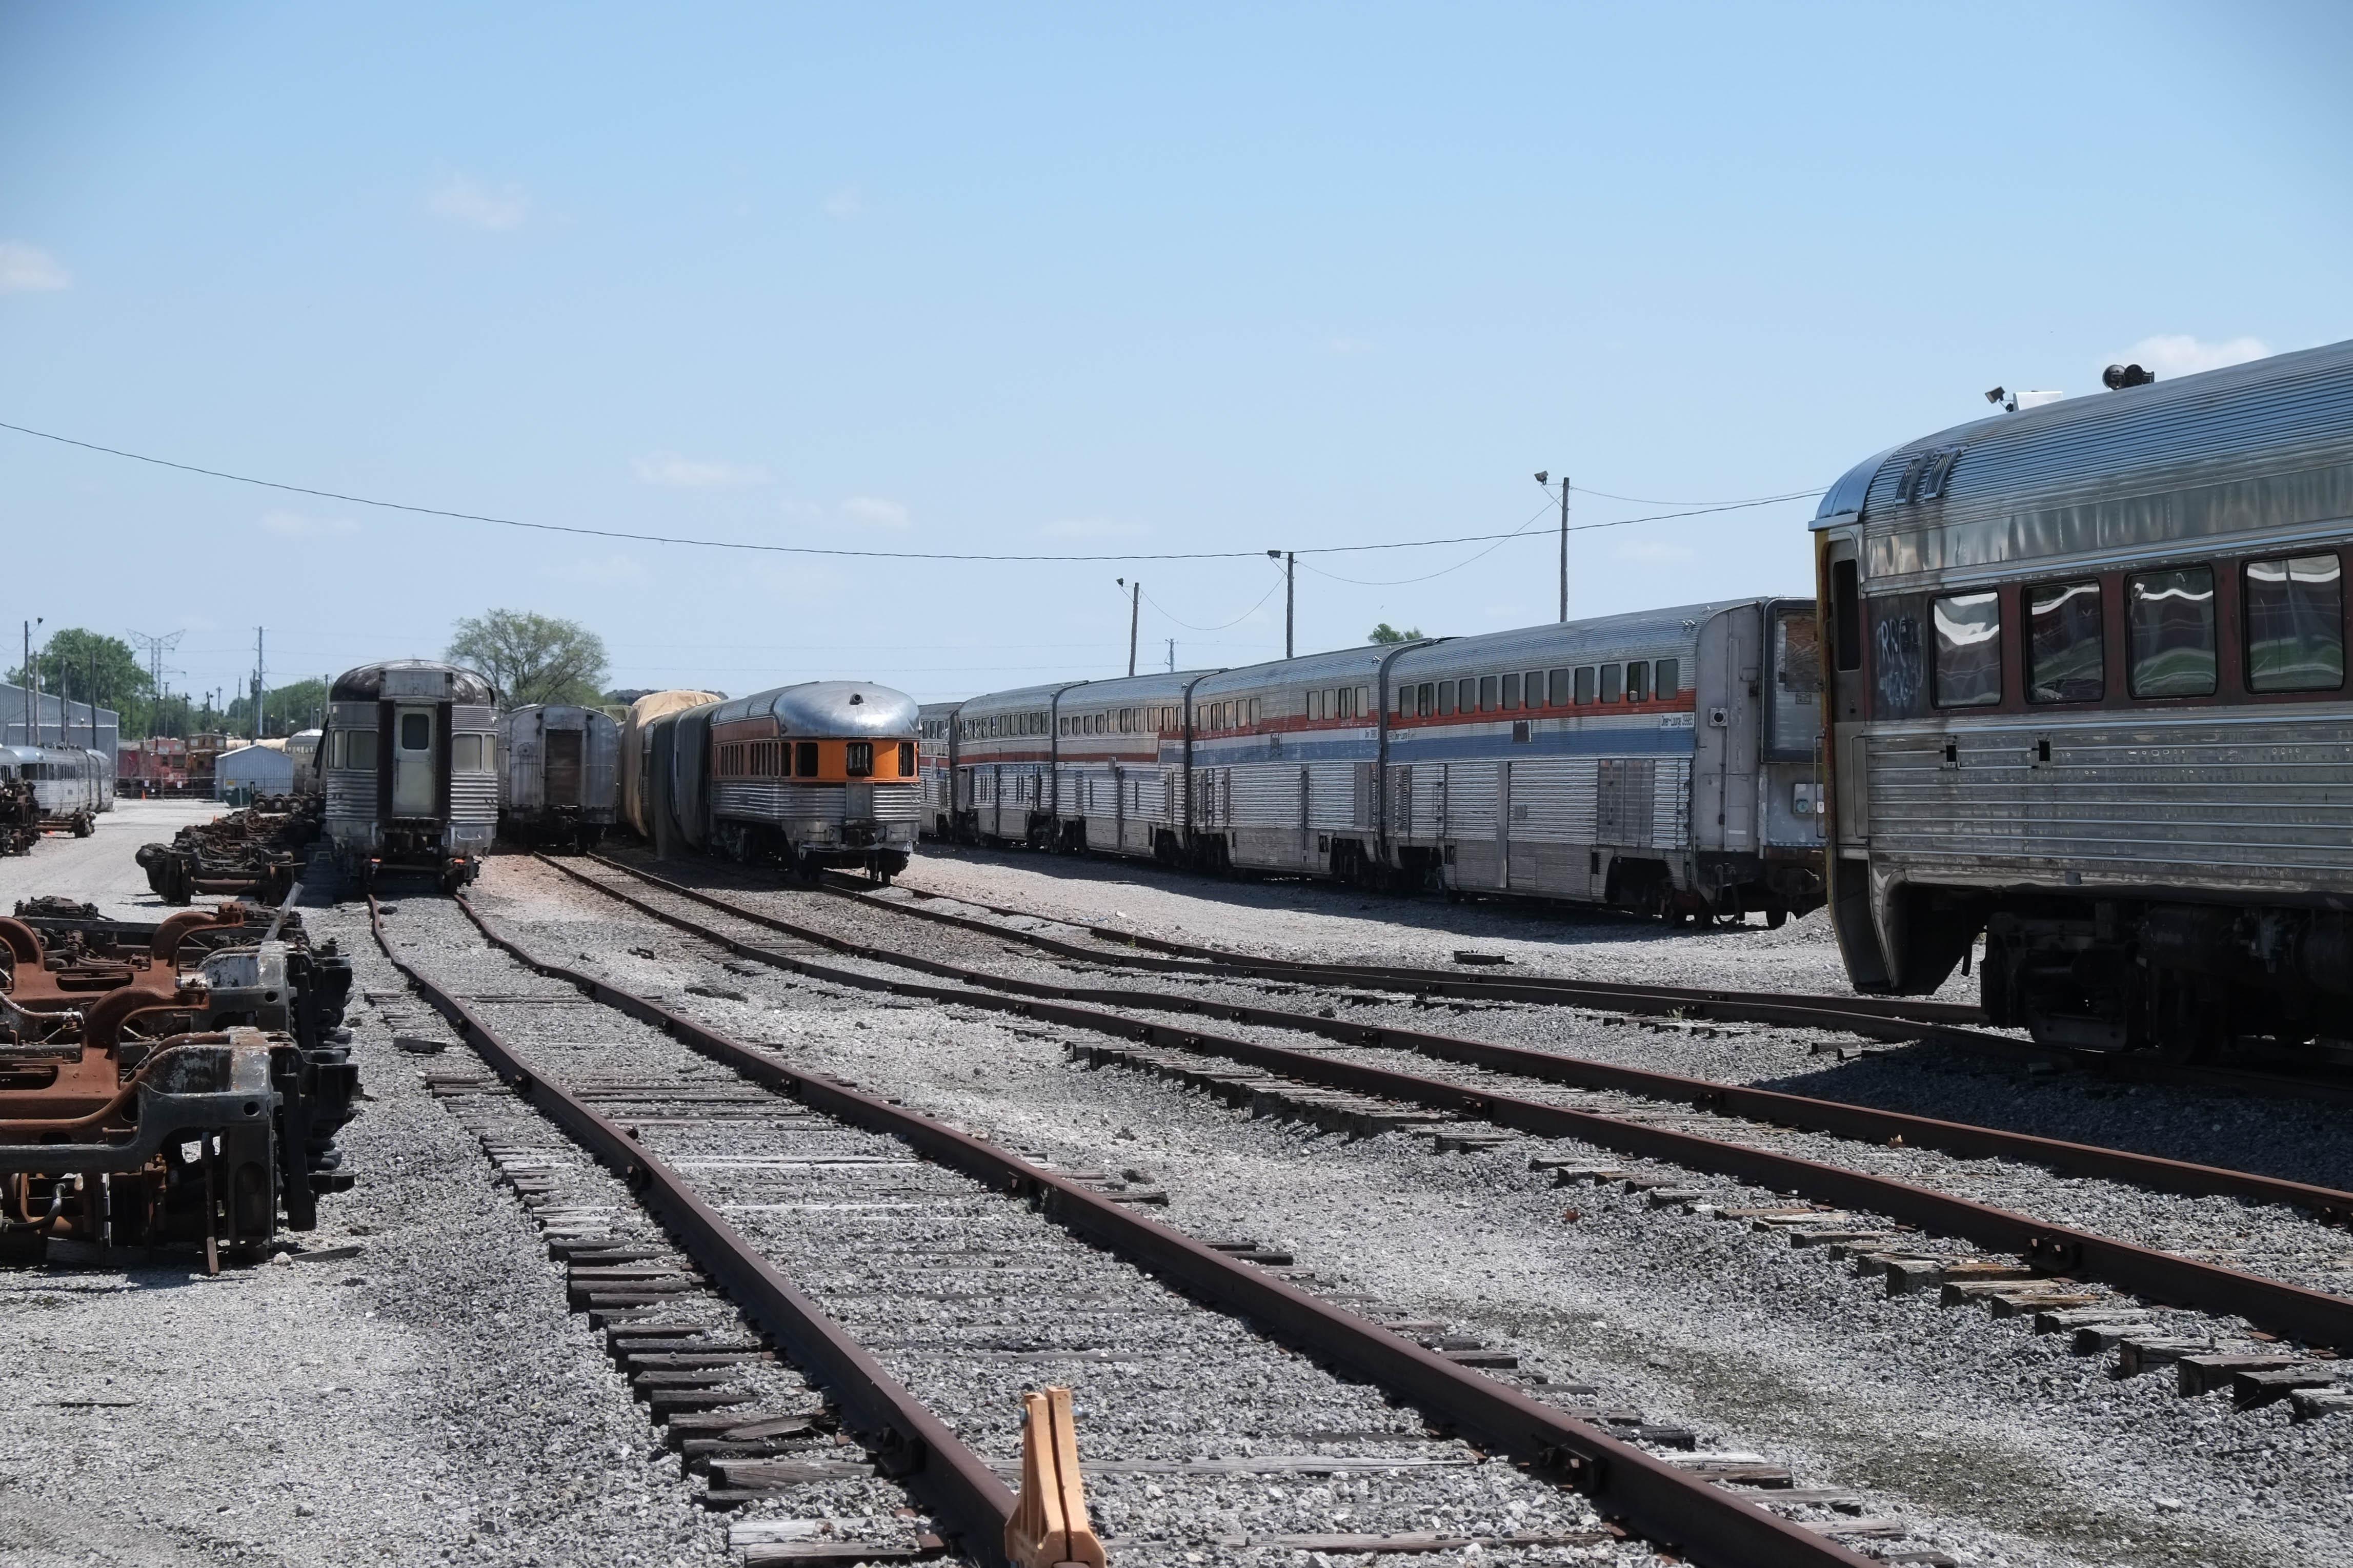 File:Equipment in Gateway Rail Services yard, May 2017 jpg